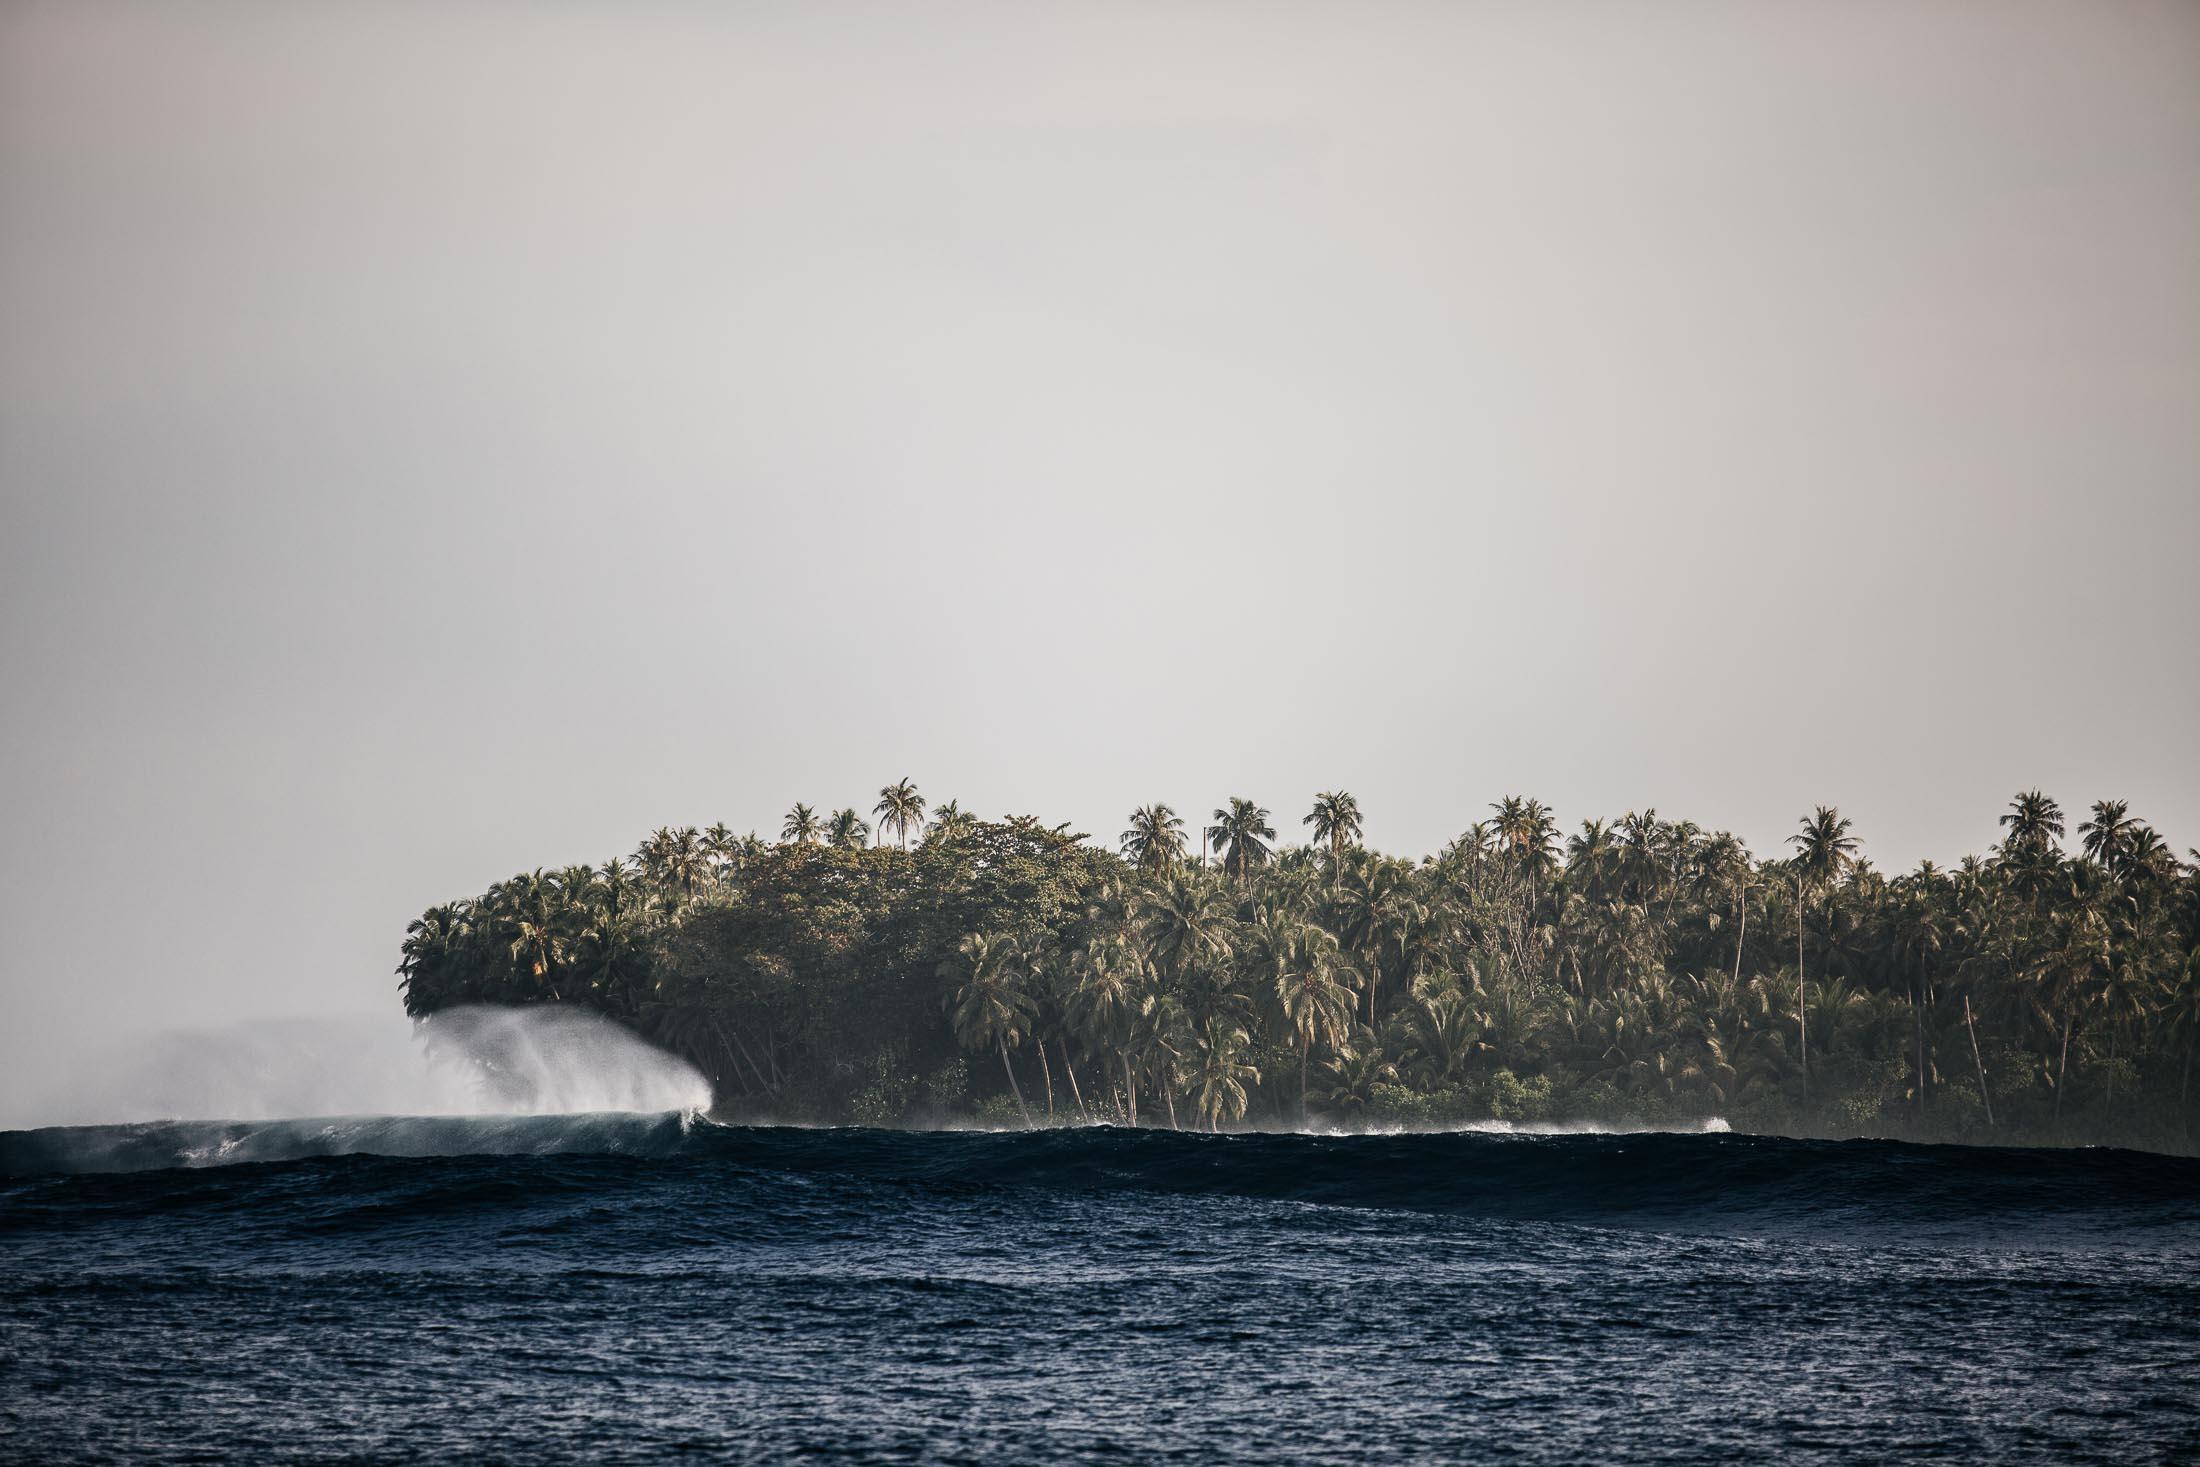 TELO ISLANDS 17